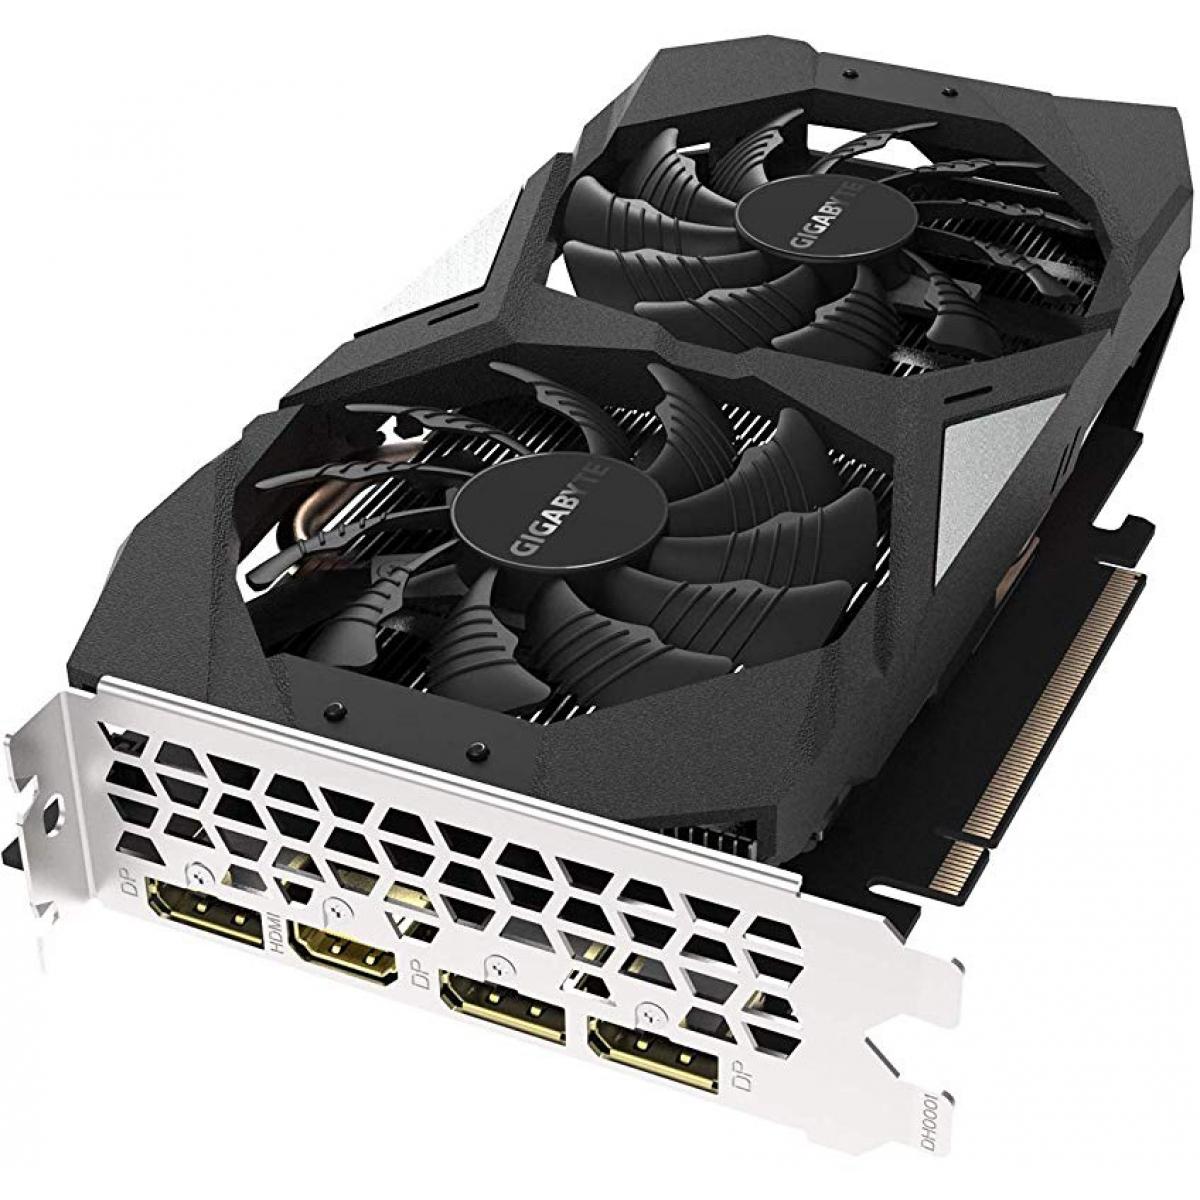 Placa de Vídeo Gigabyte GeForce GTX 1660 Ti OC Dual, 6GB GDDR6, 192Bit, GV-N166TOC-6GD